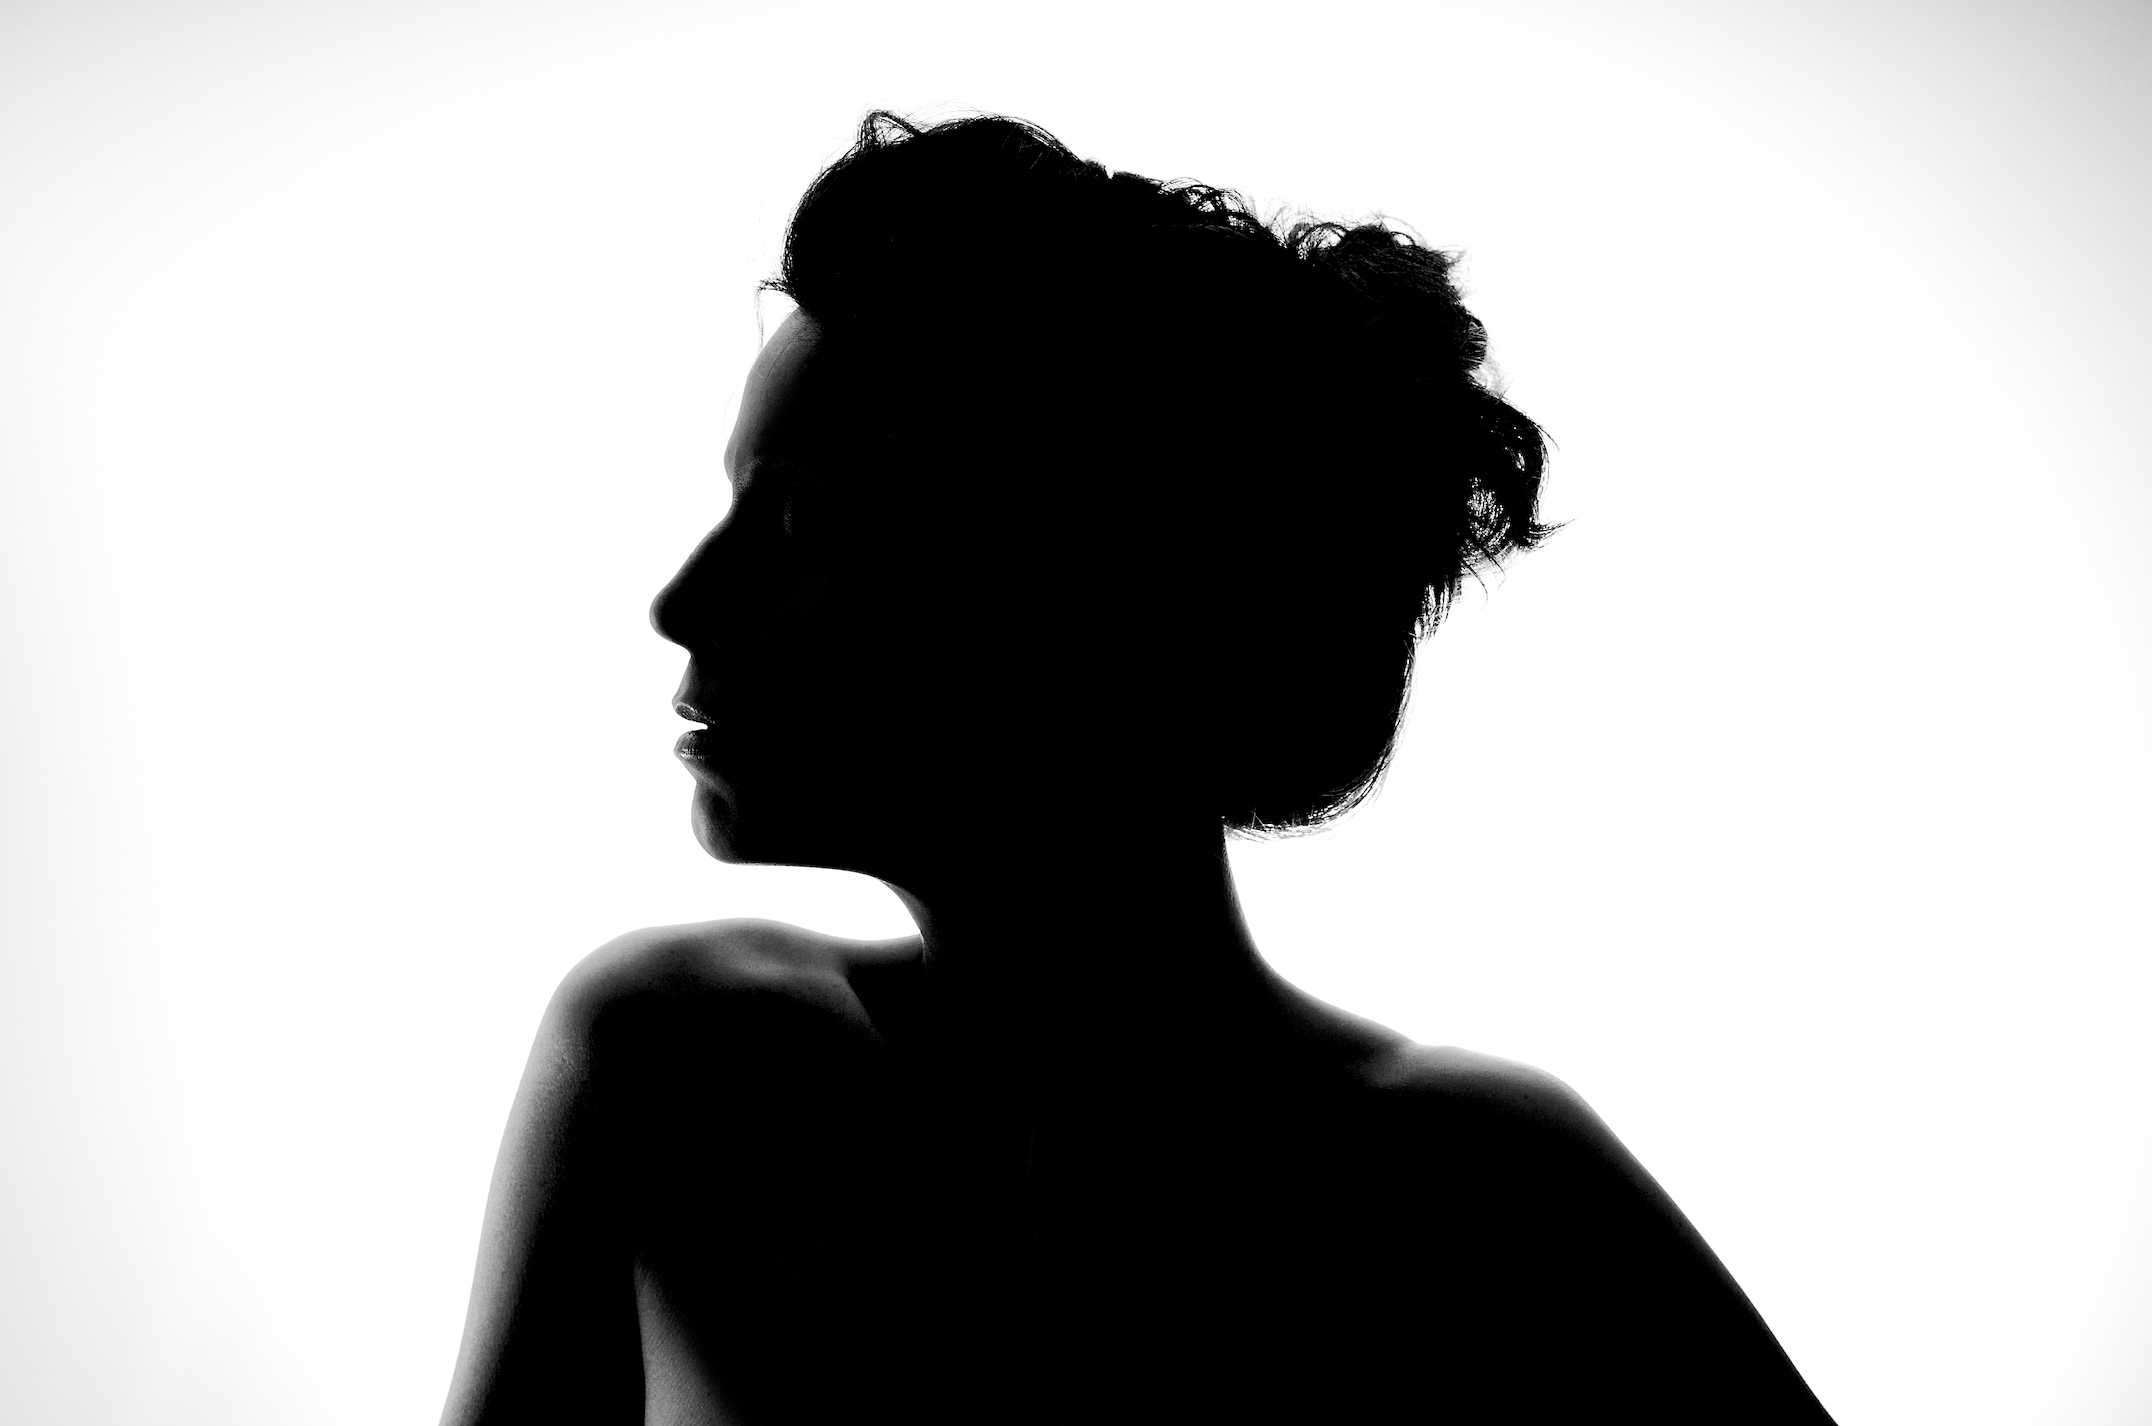 2152x1426 Portrait Silhouette Clip Art 7064704196a5cf5db1dff3c1ddc1b486